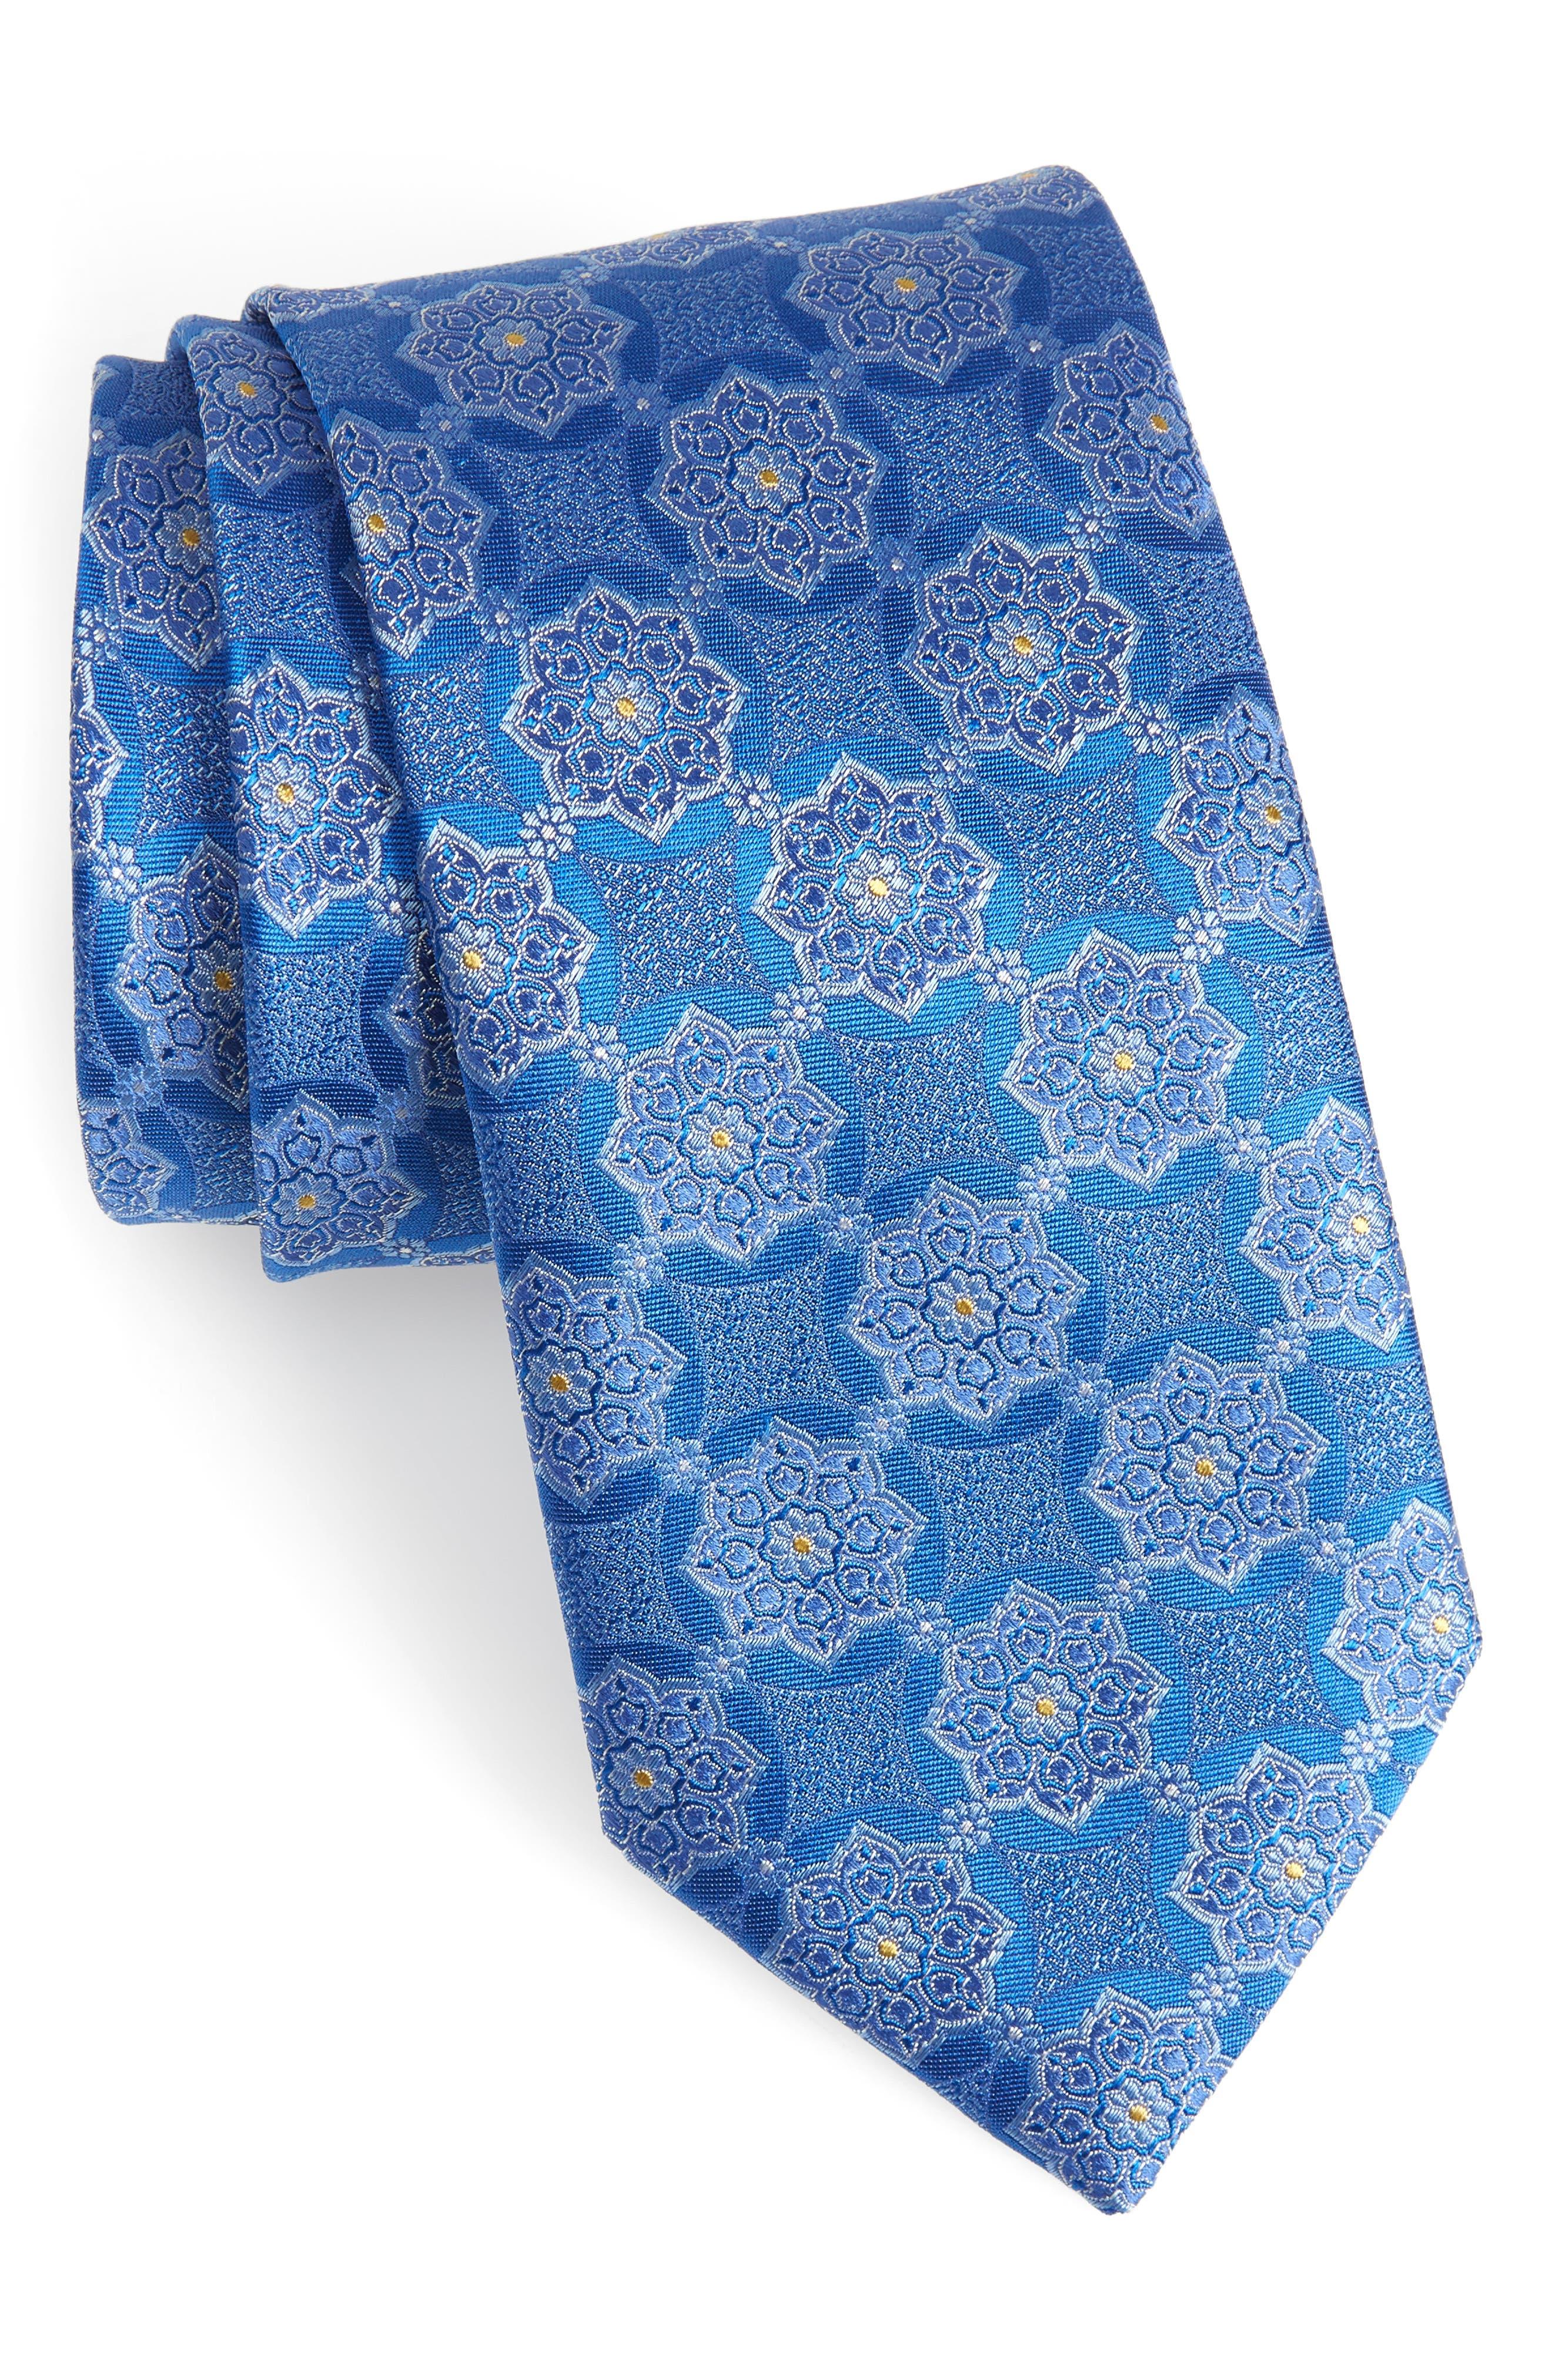 Medallion Silk Tie,                             Main thumbnail 1, color,                             420